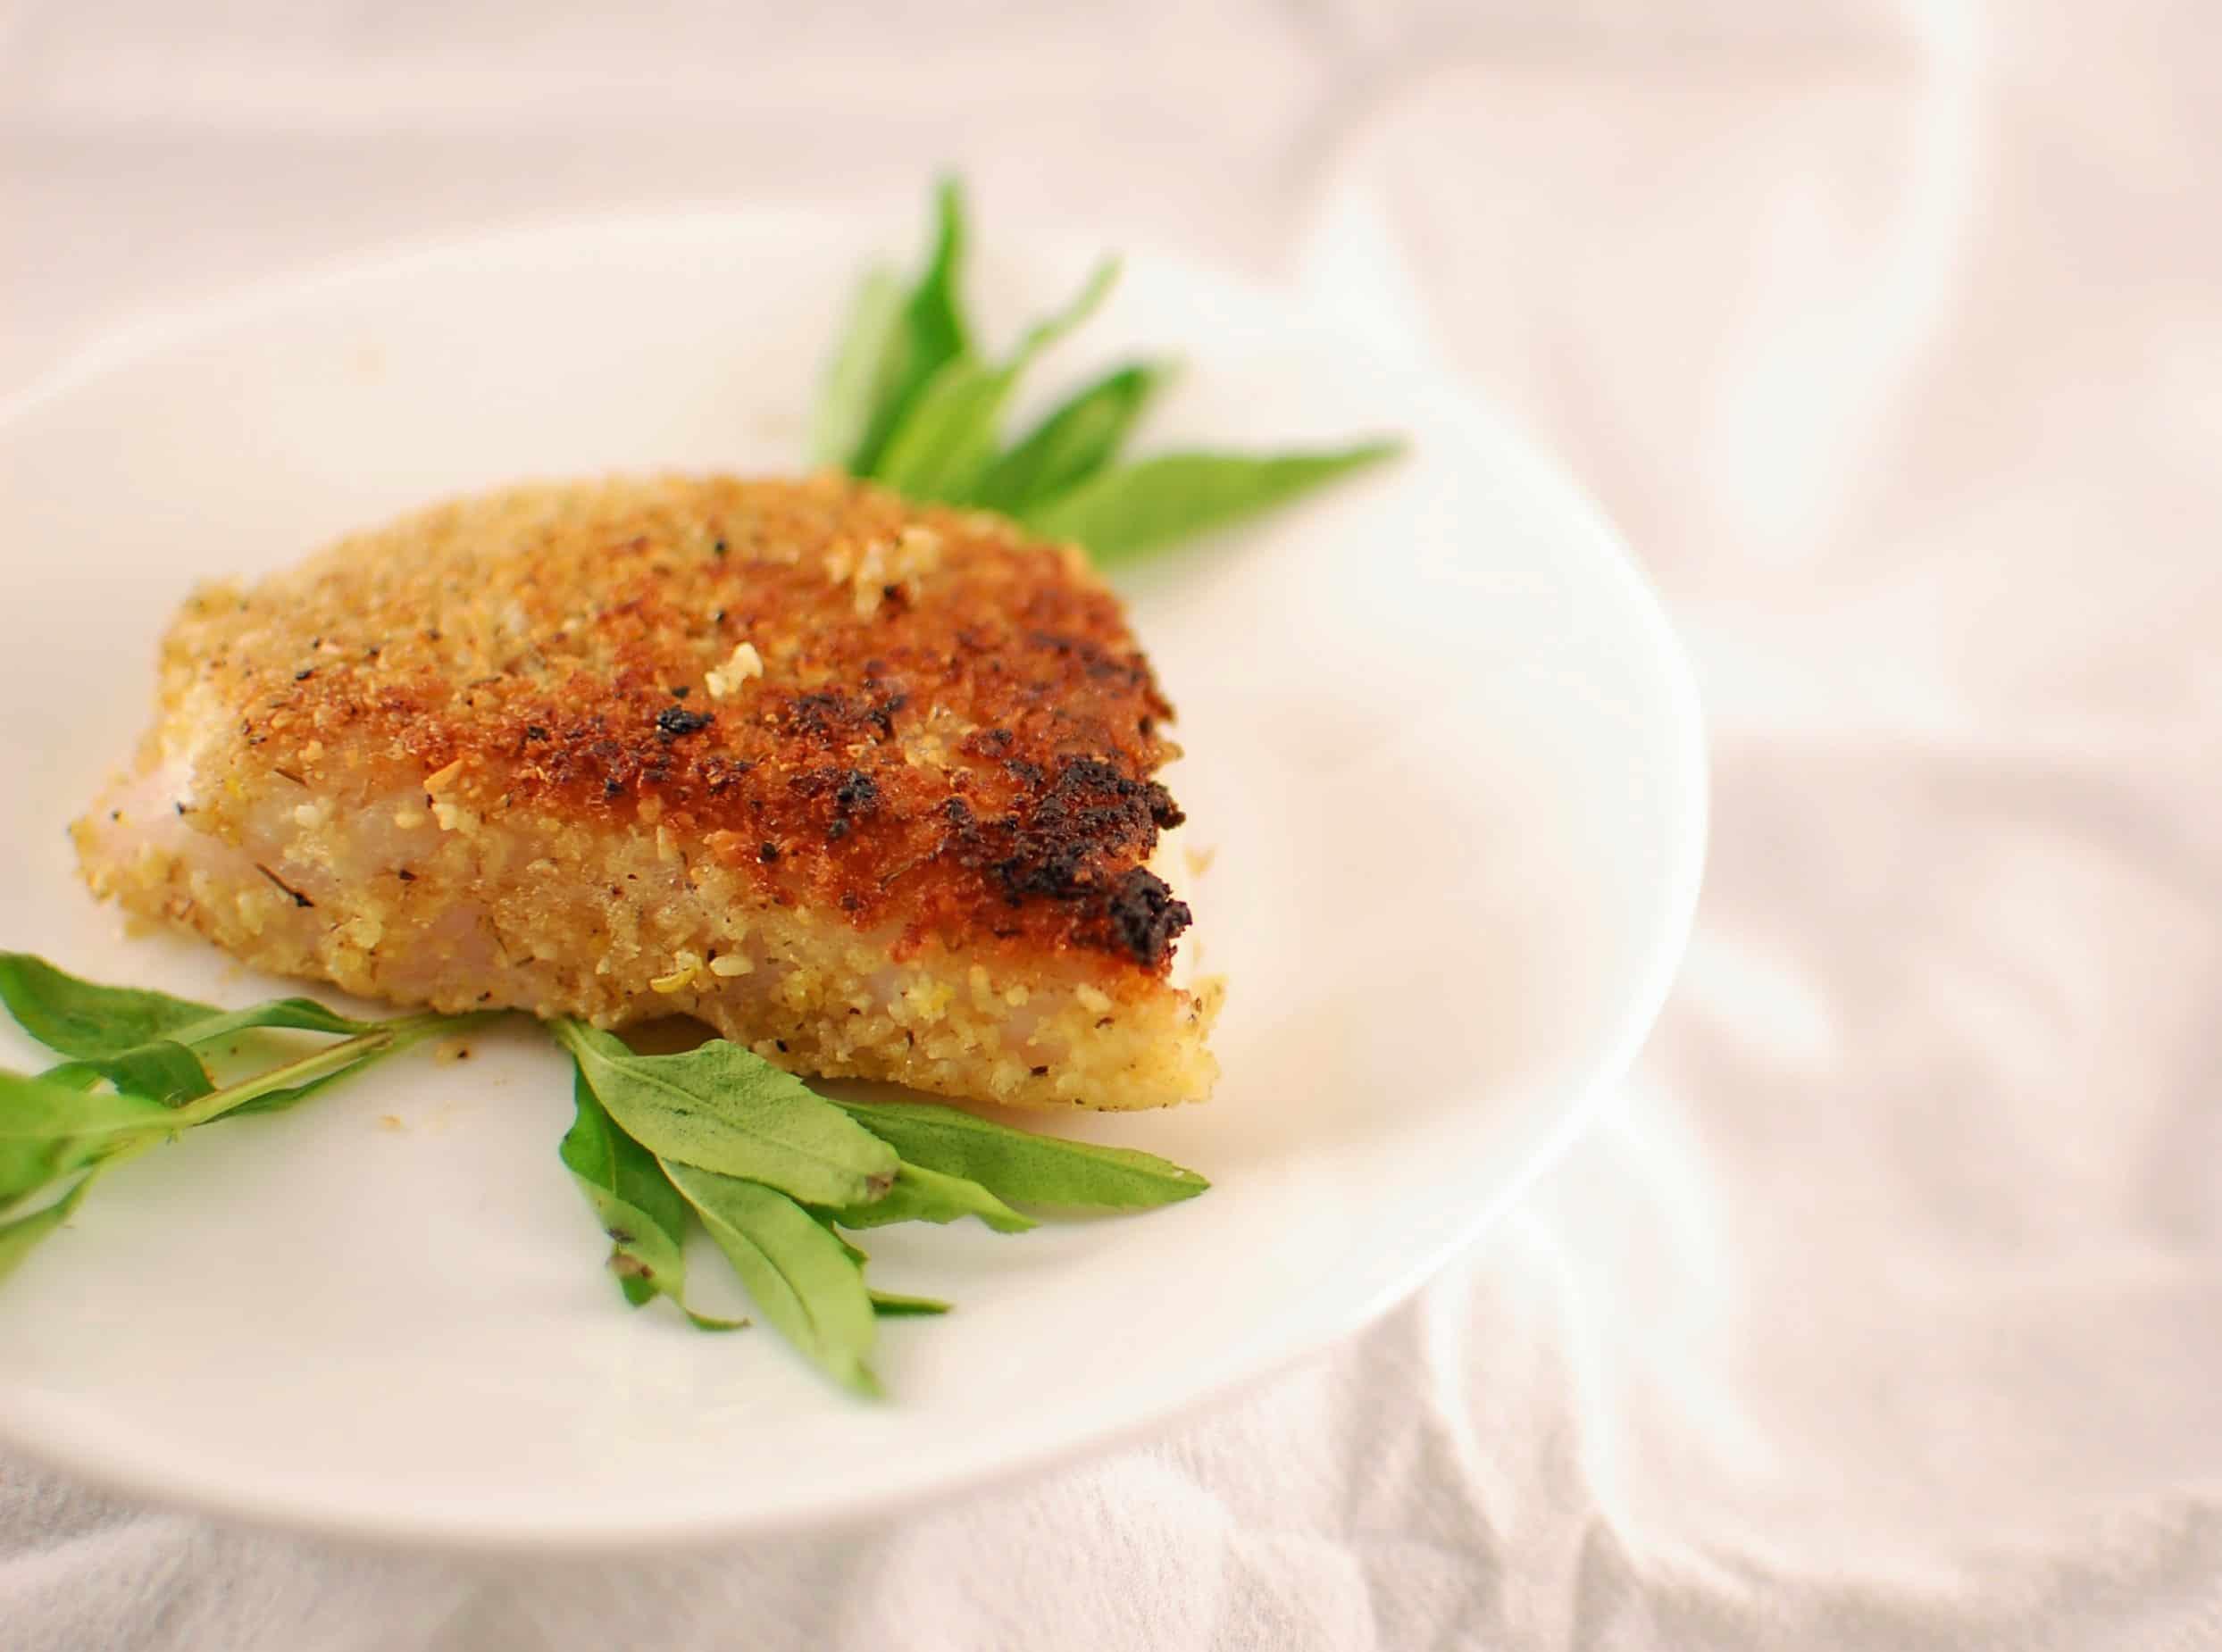 Pine nut breaded fish